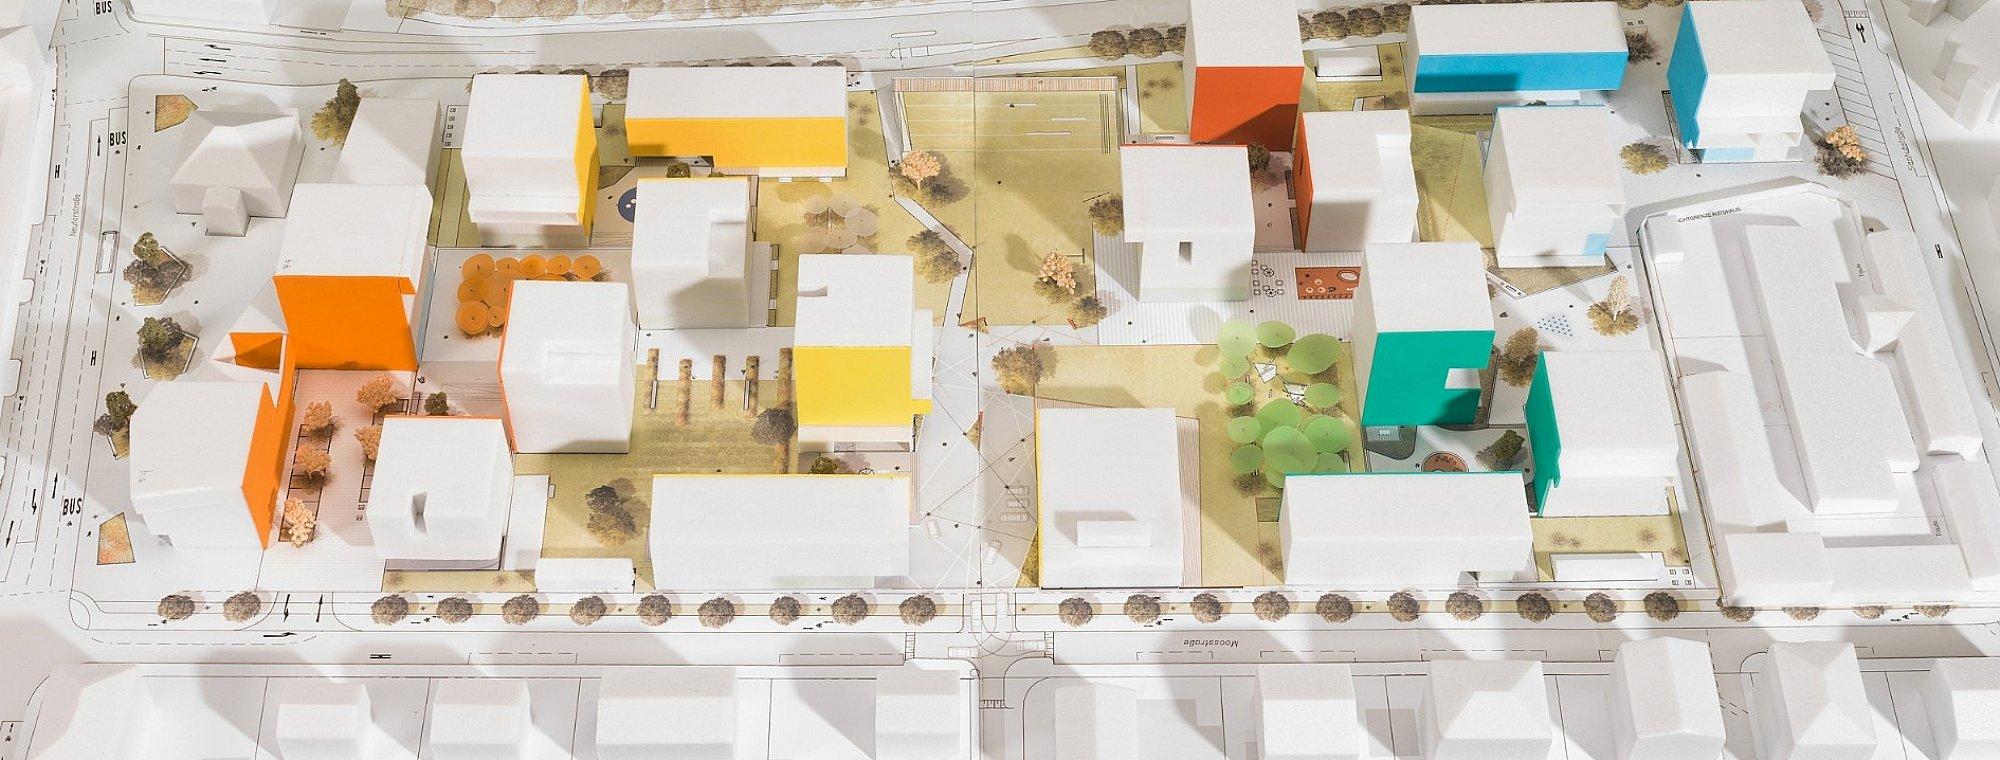 Modell Sicht Moosstraße oben © Hannes Auer